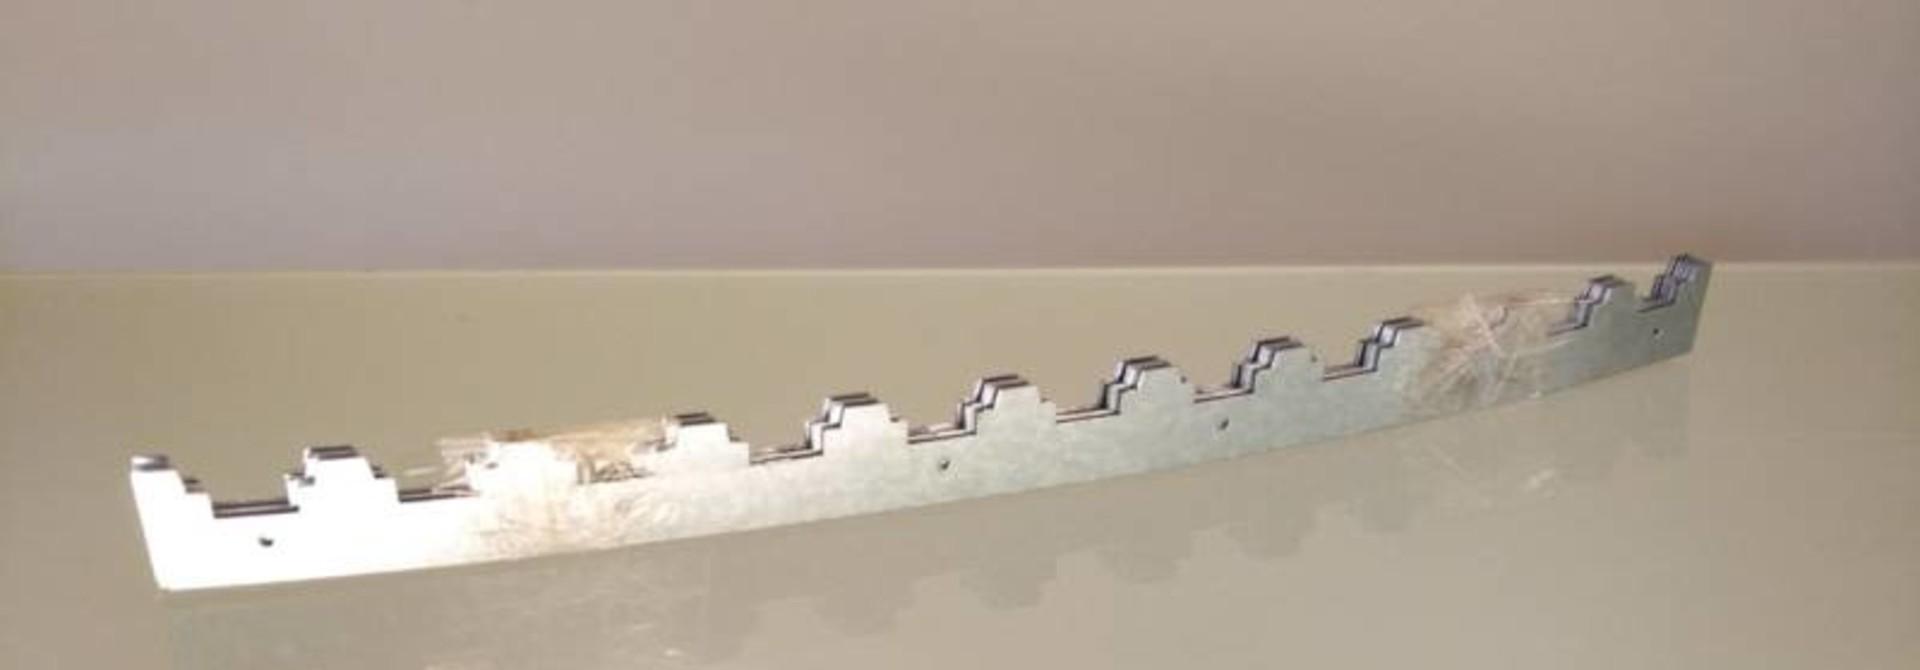 Bledden 11 ramen - per 10 stuks